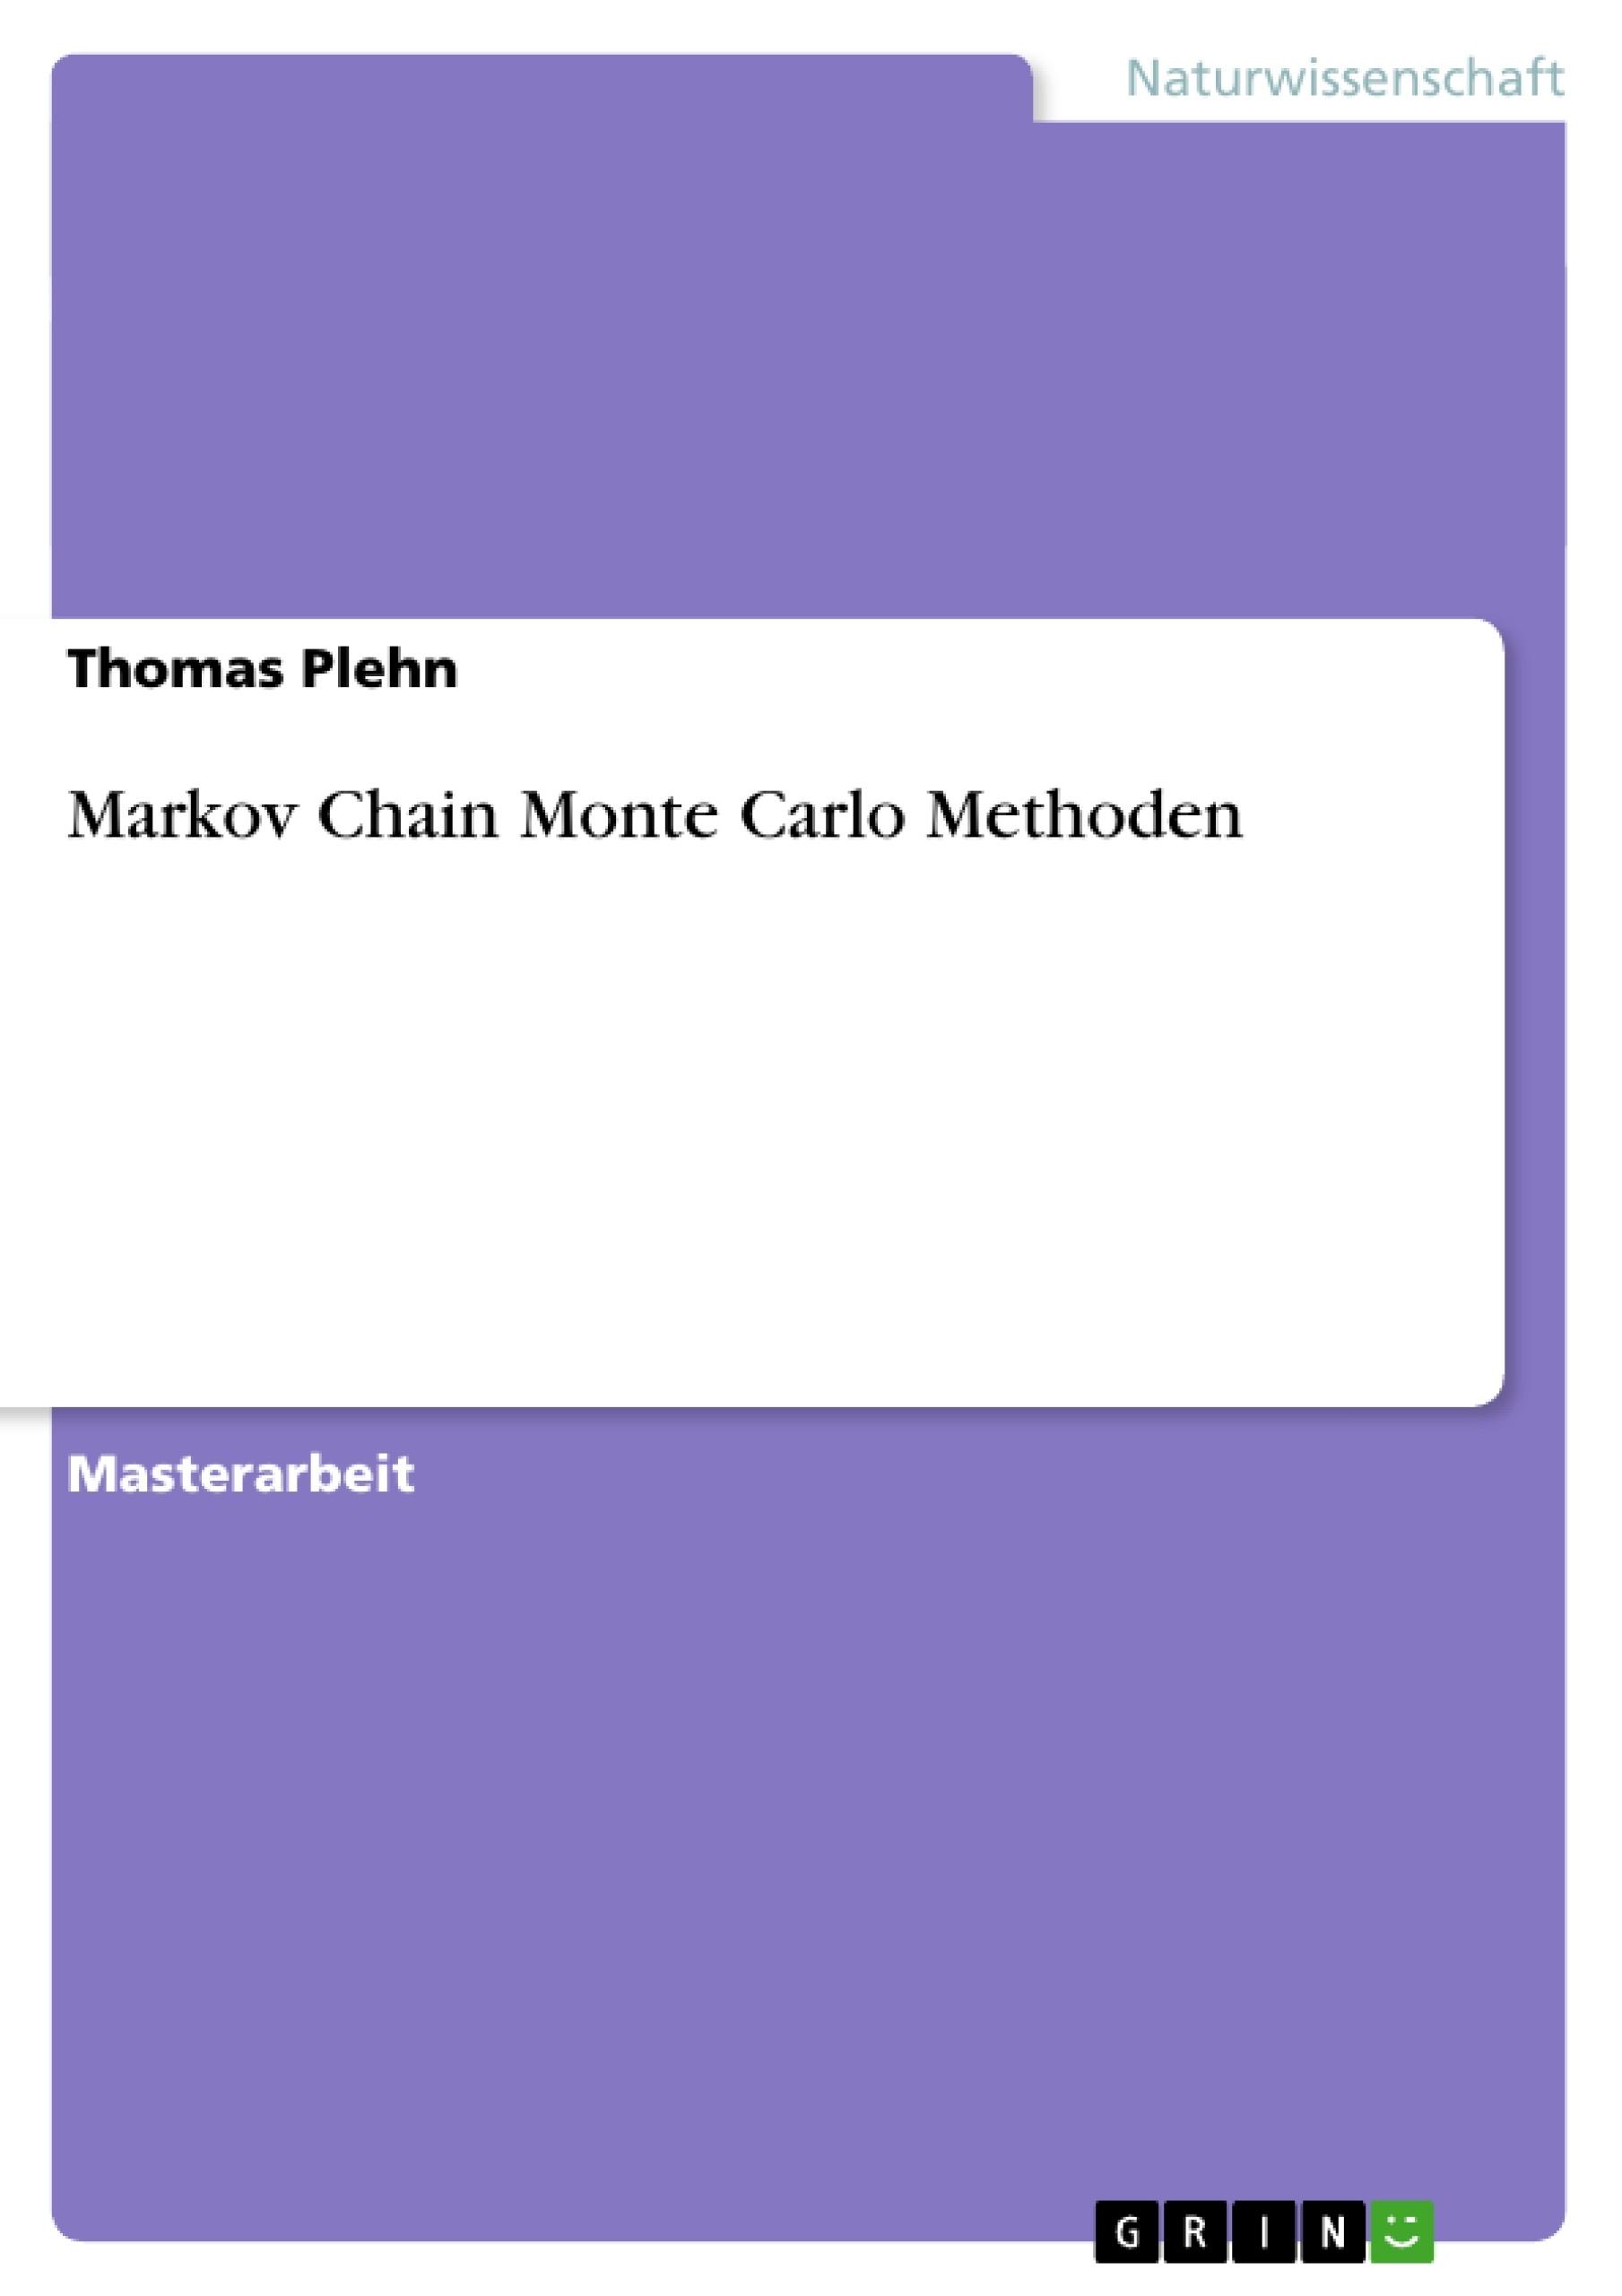 Titel: Markov Chain Monte Carlo Methoden